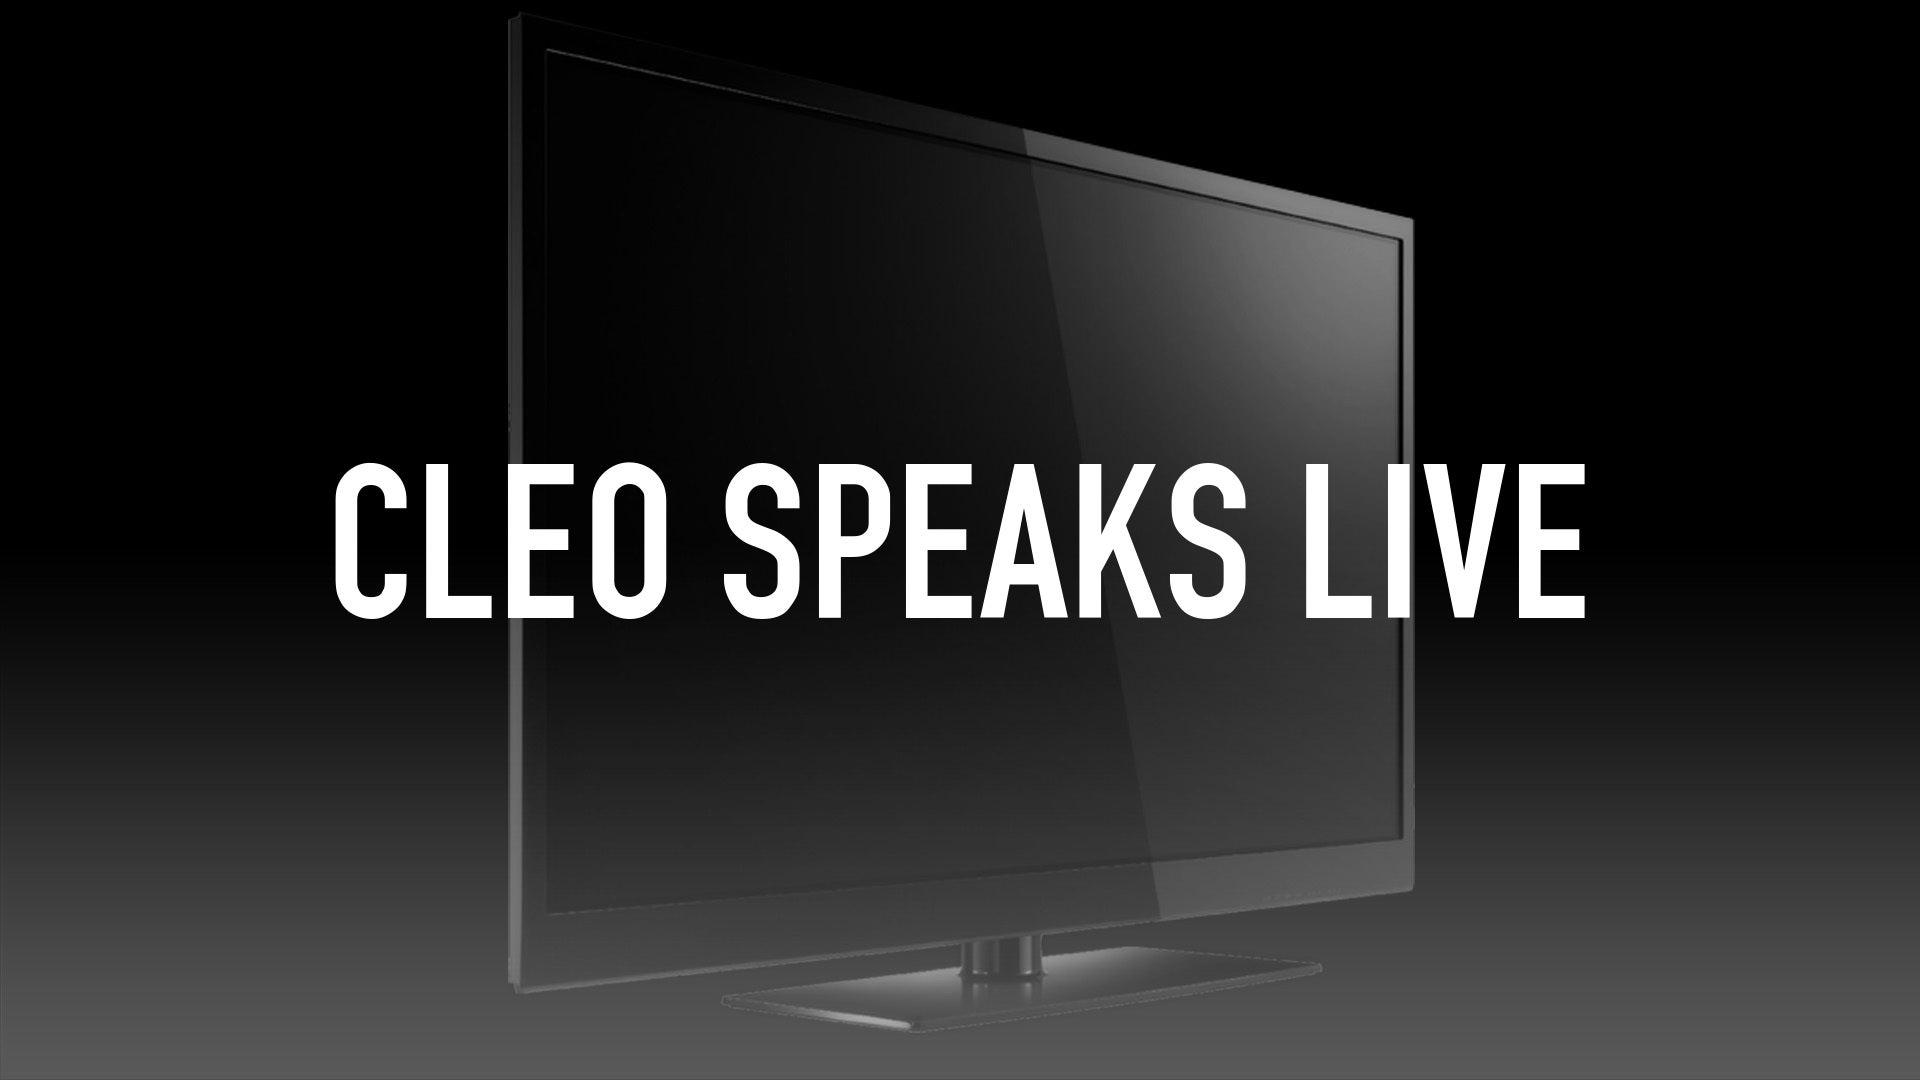 Cleo Speaks Live